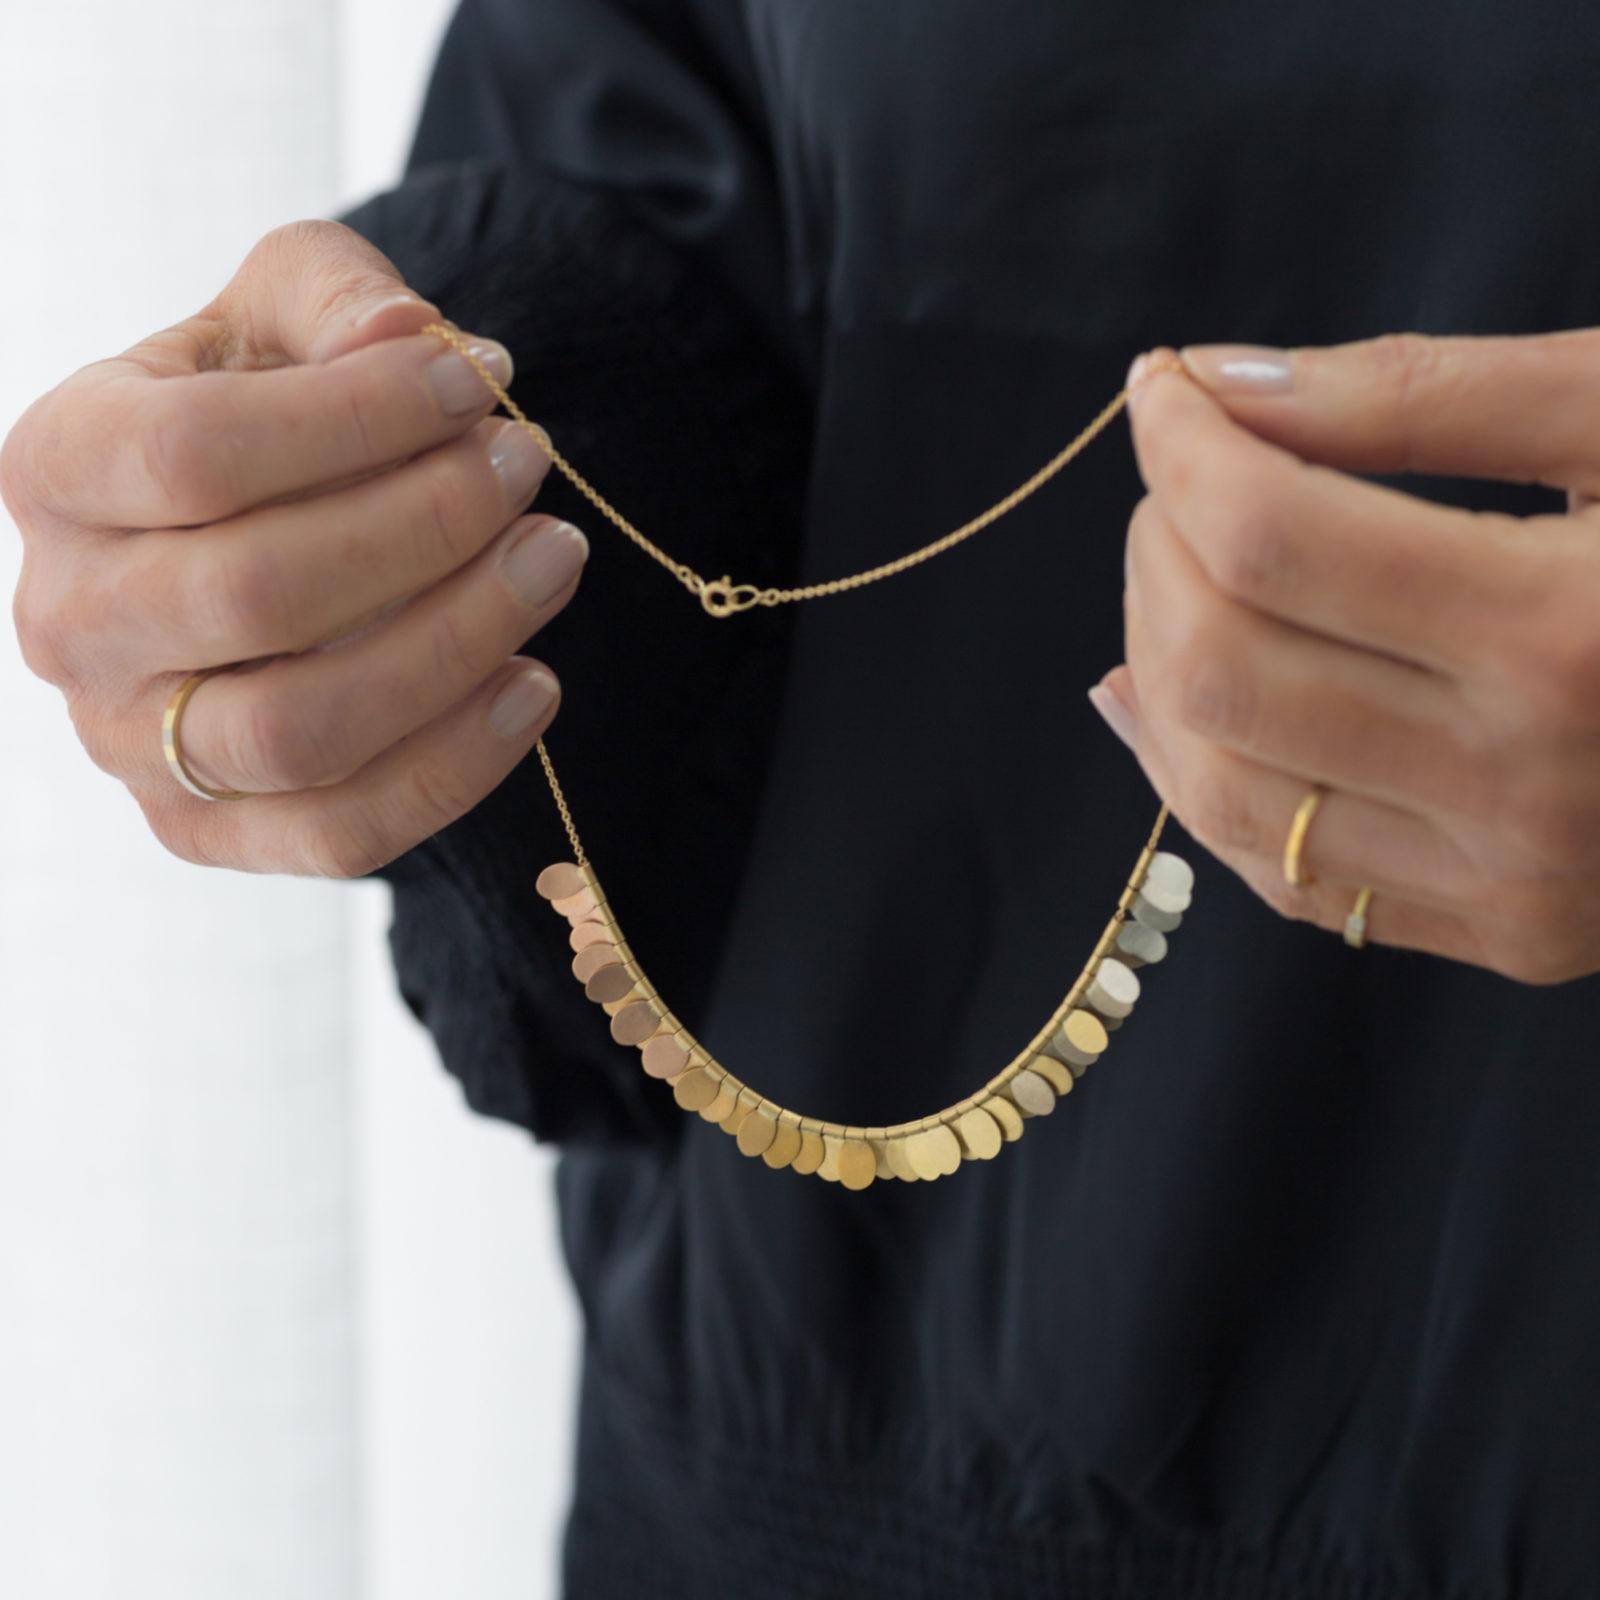 Sia Taylor FN1 YRAIN Rainbow Gold Necklace Hand M